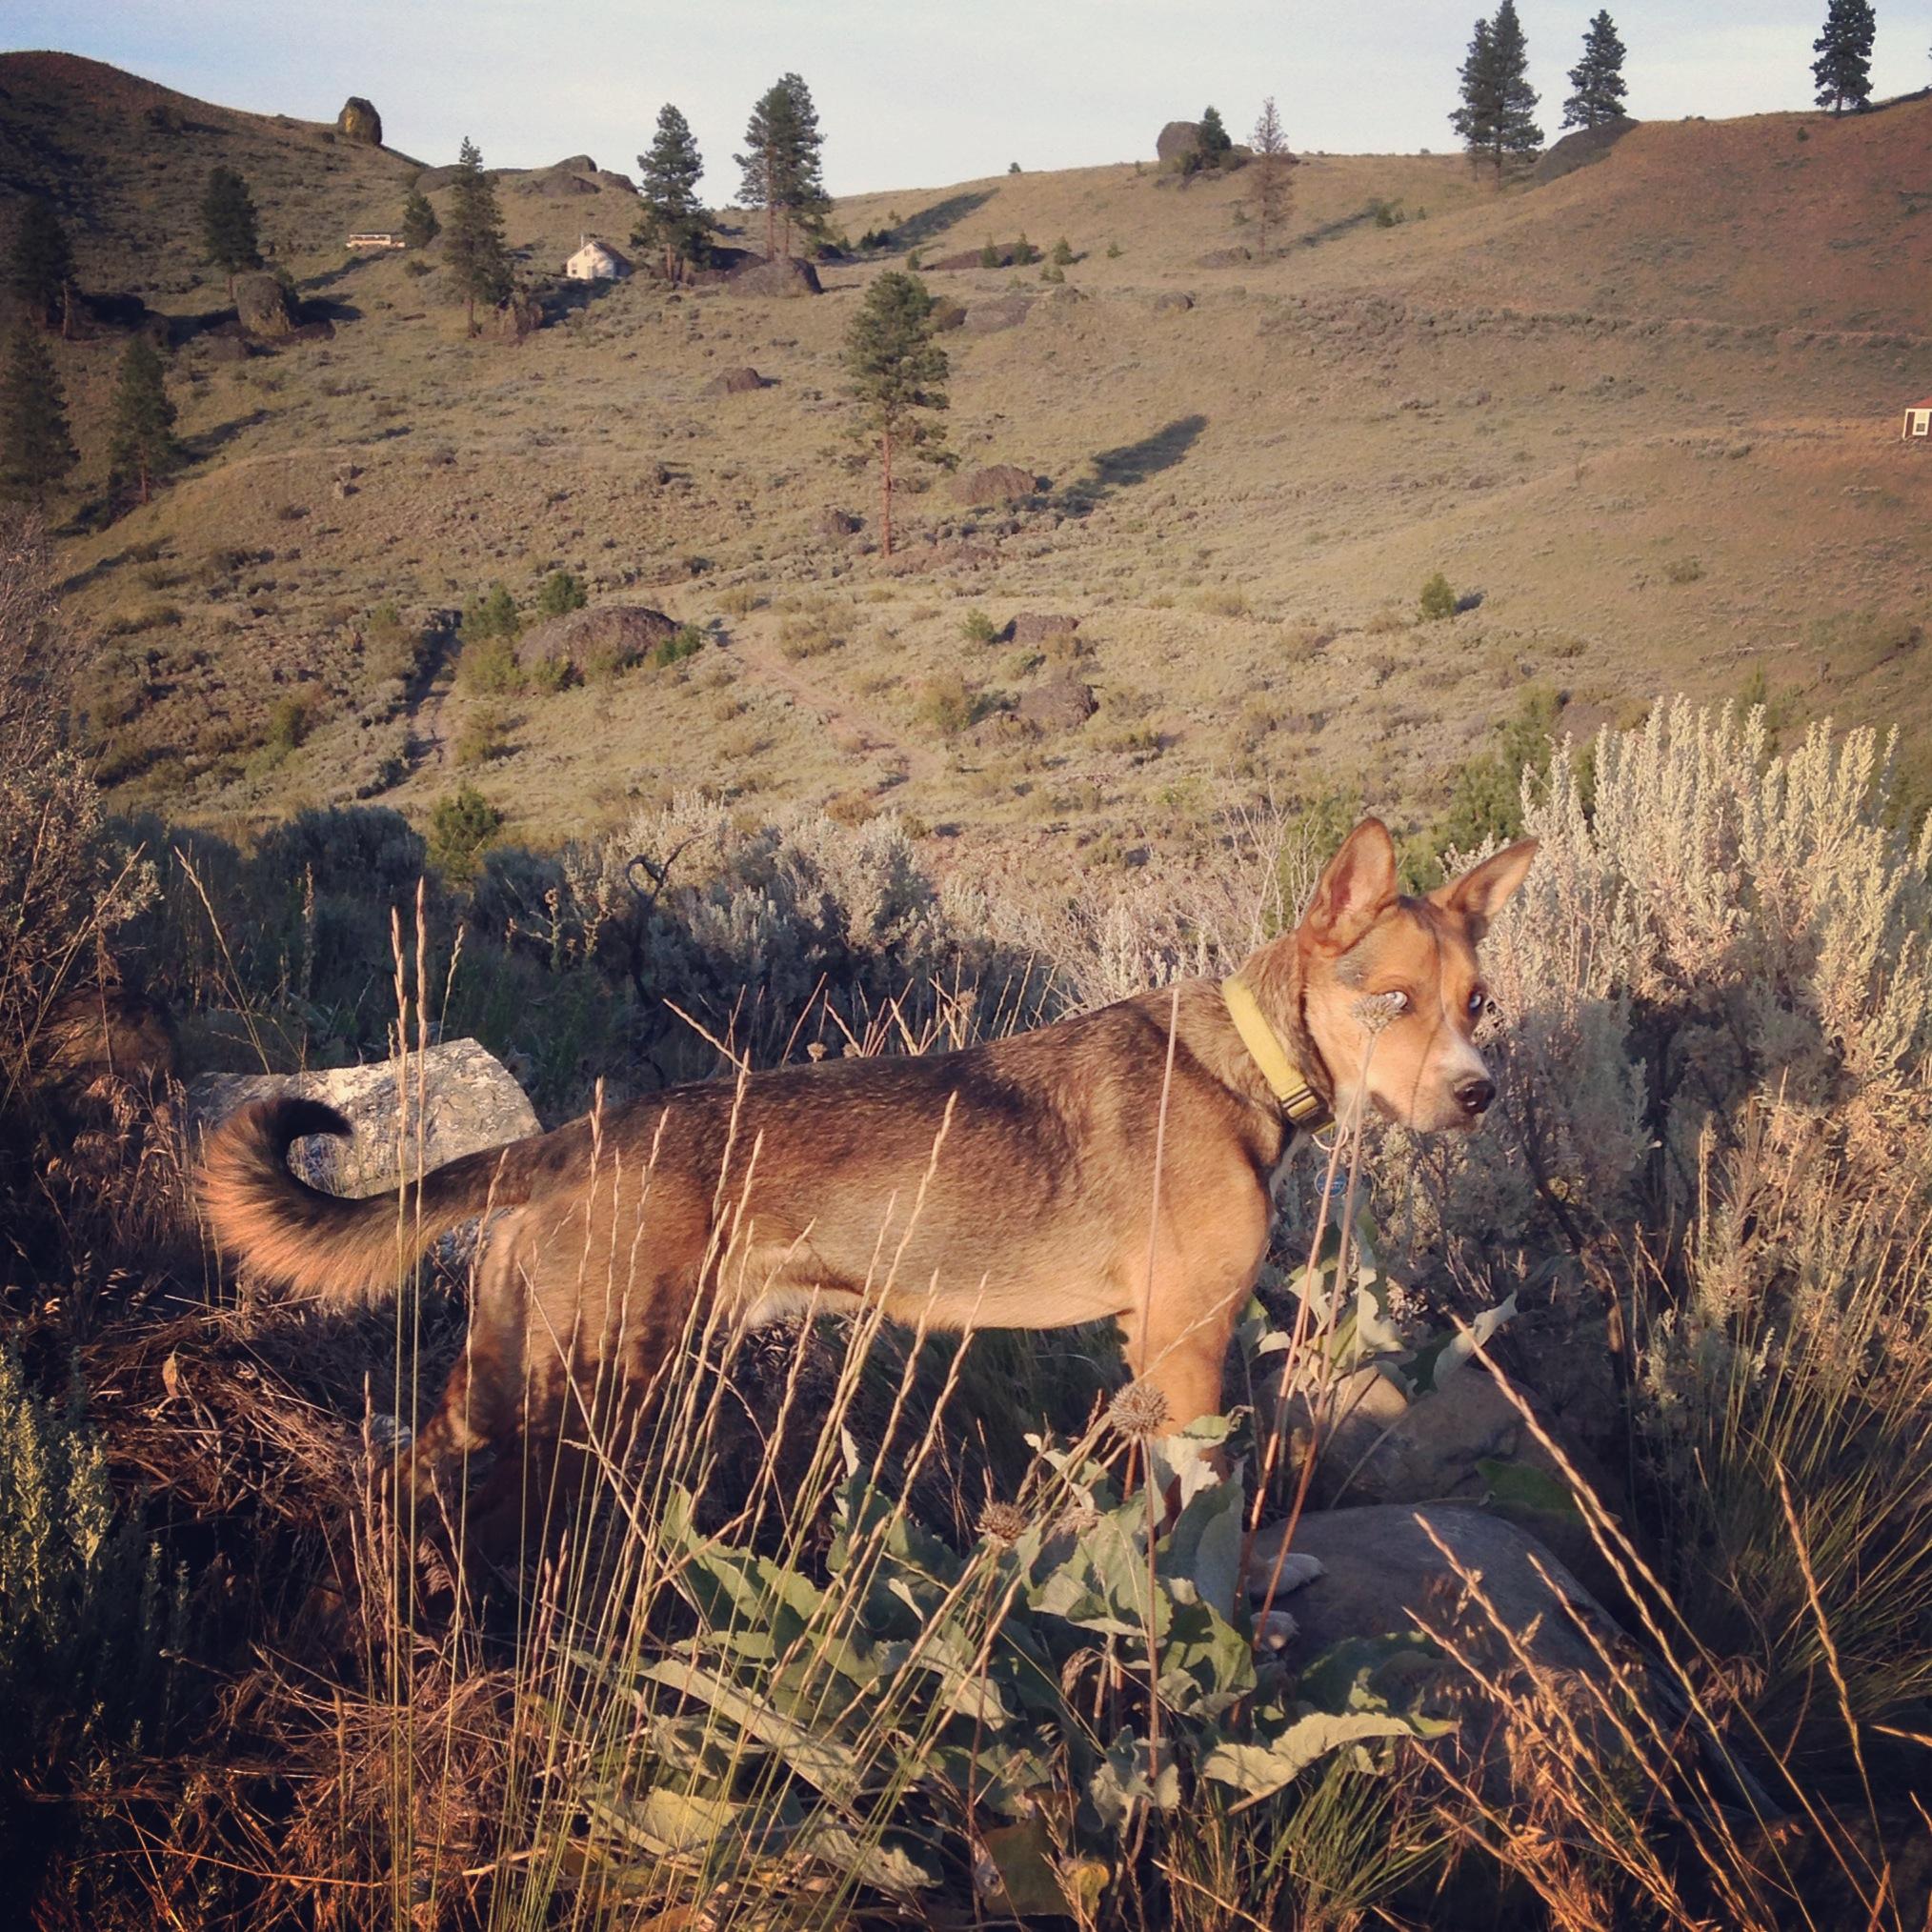 Zeus, the ever-vigilant deer chaser.